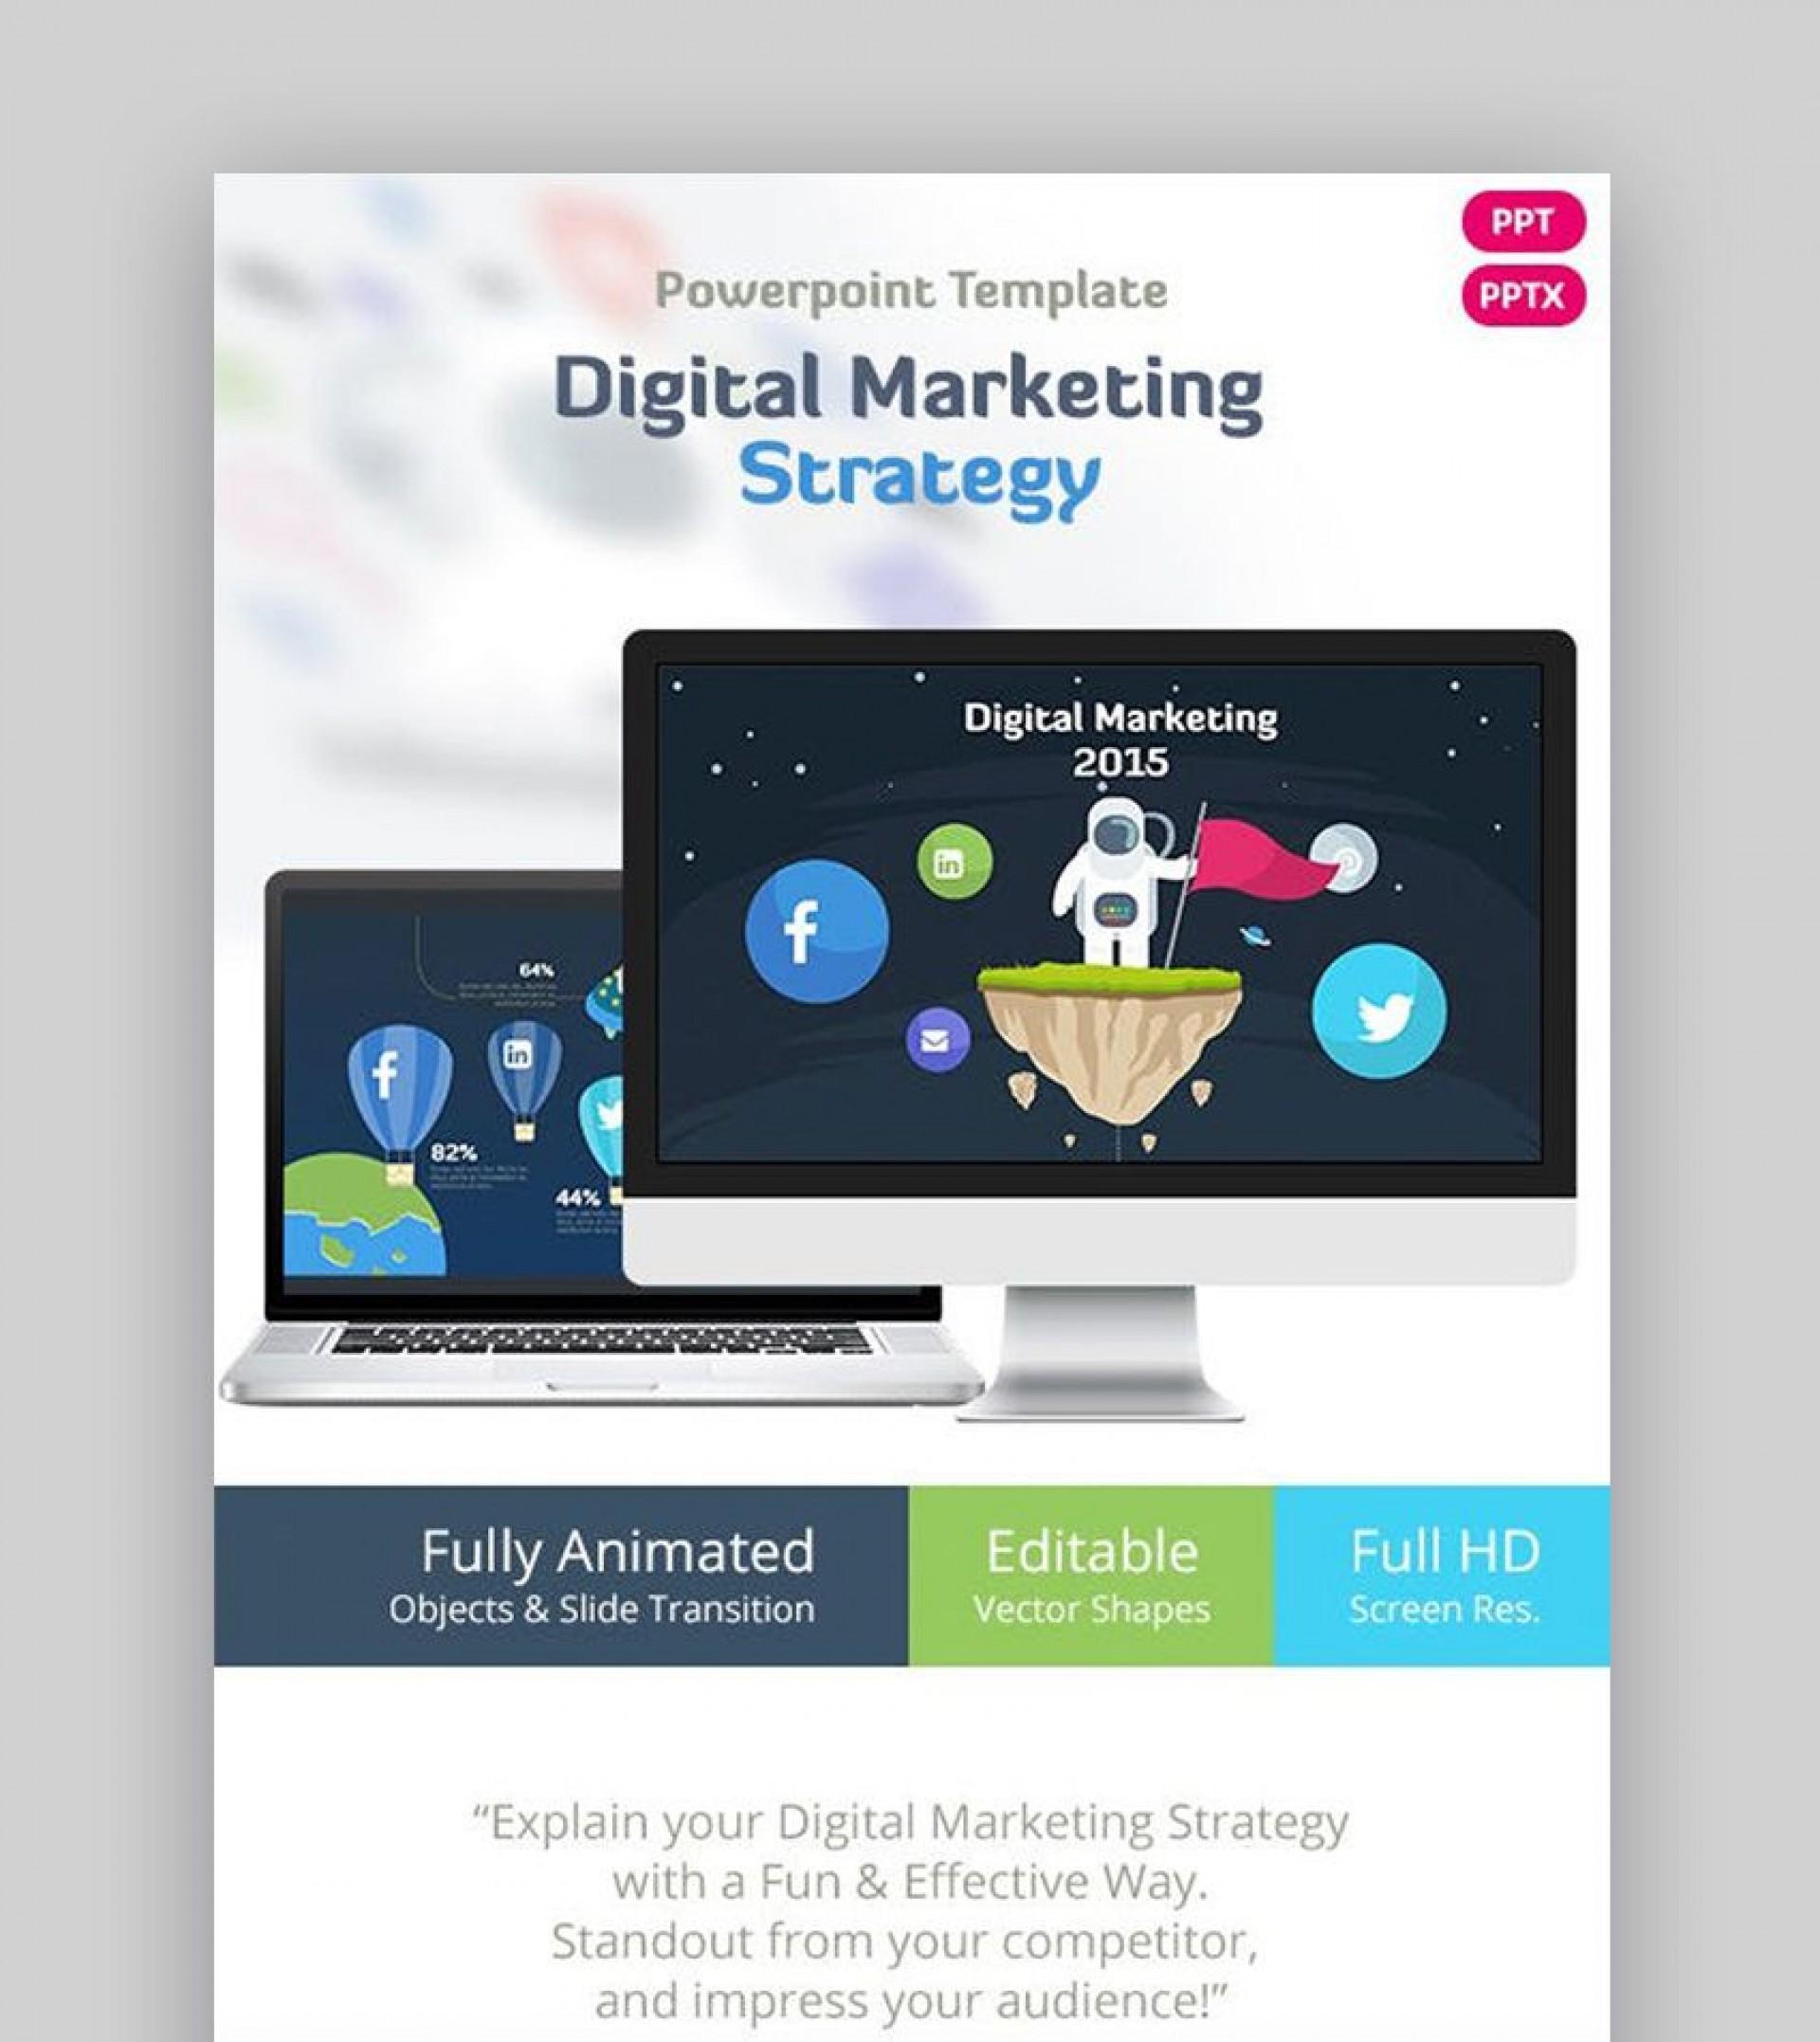 010 Surprising Digital Marketing Plan Template Ppt Design  Presentation Free Slideshare1920